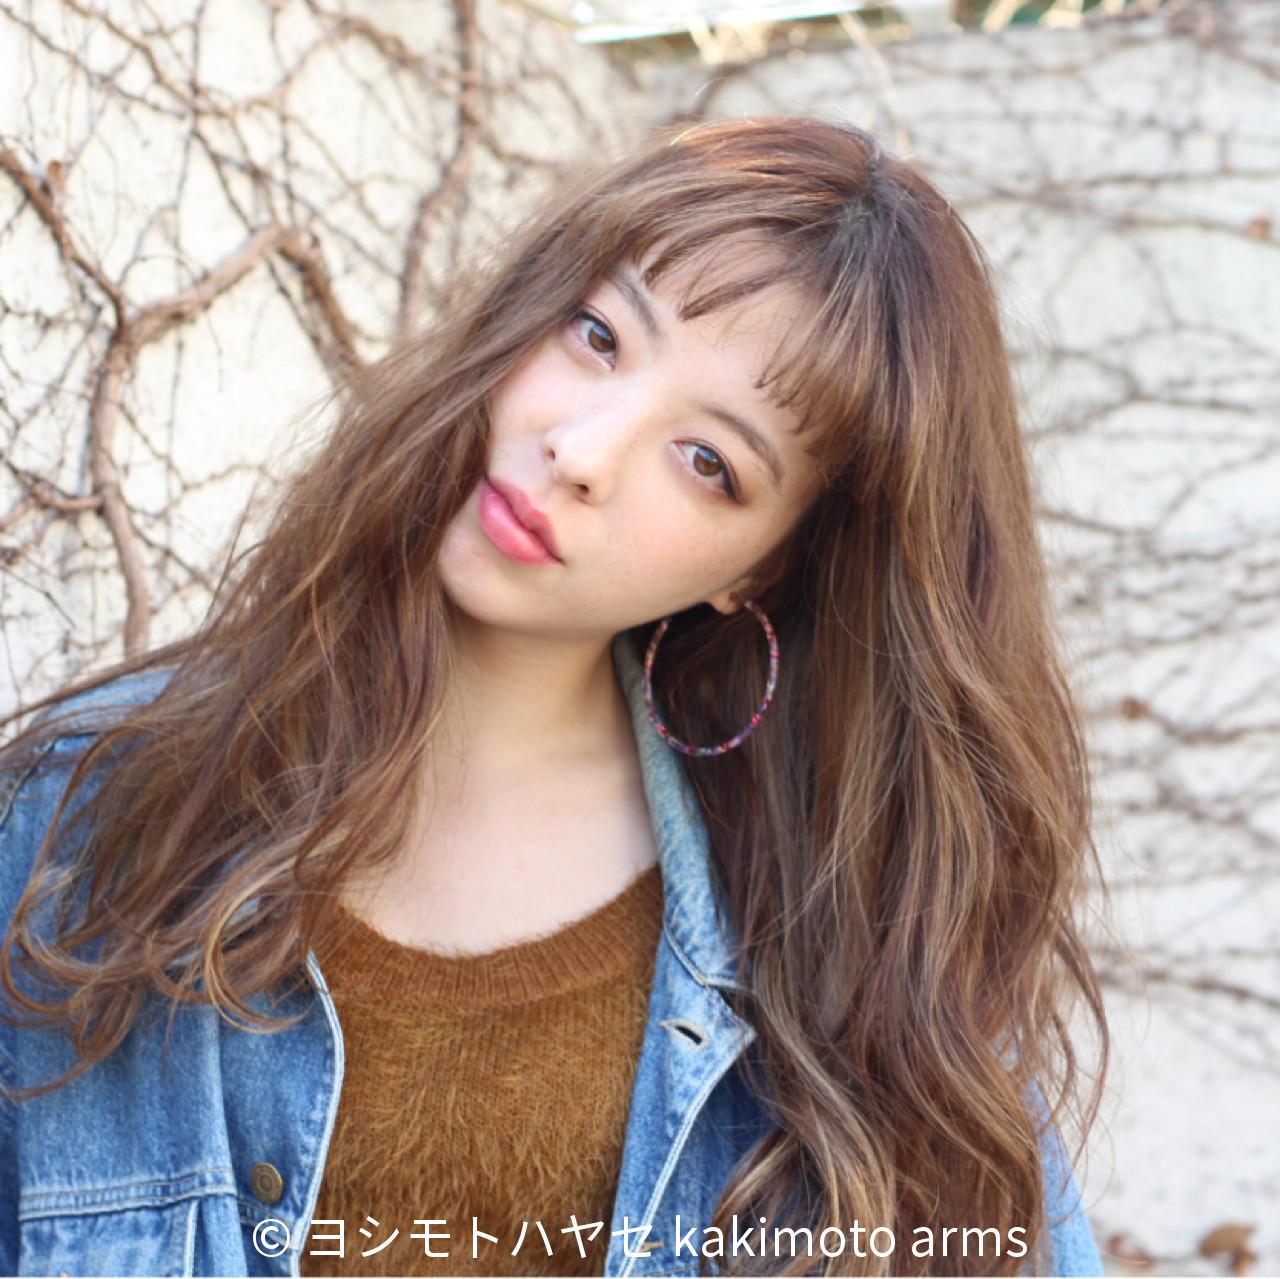 3Dカラー 前髪あり ロング フリンジバング ヘアスタイルや髪型の写真・画像